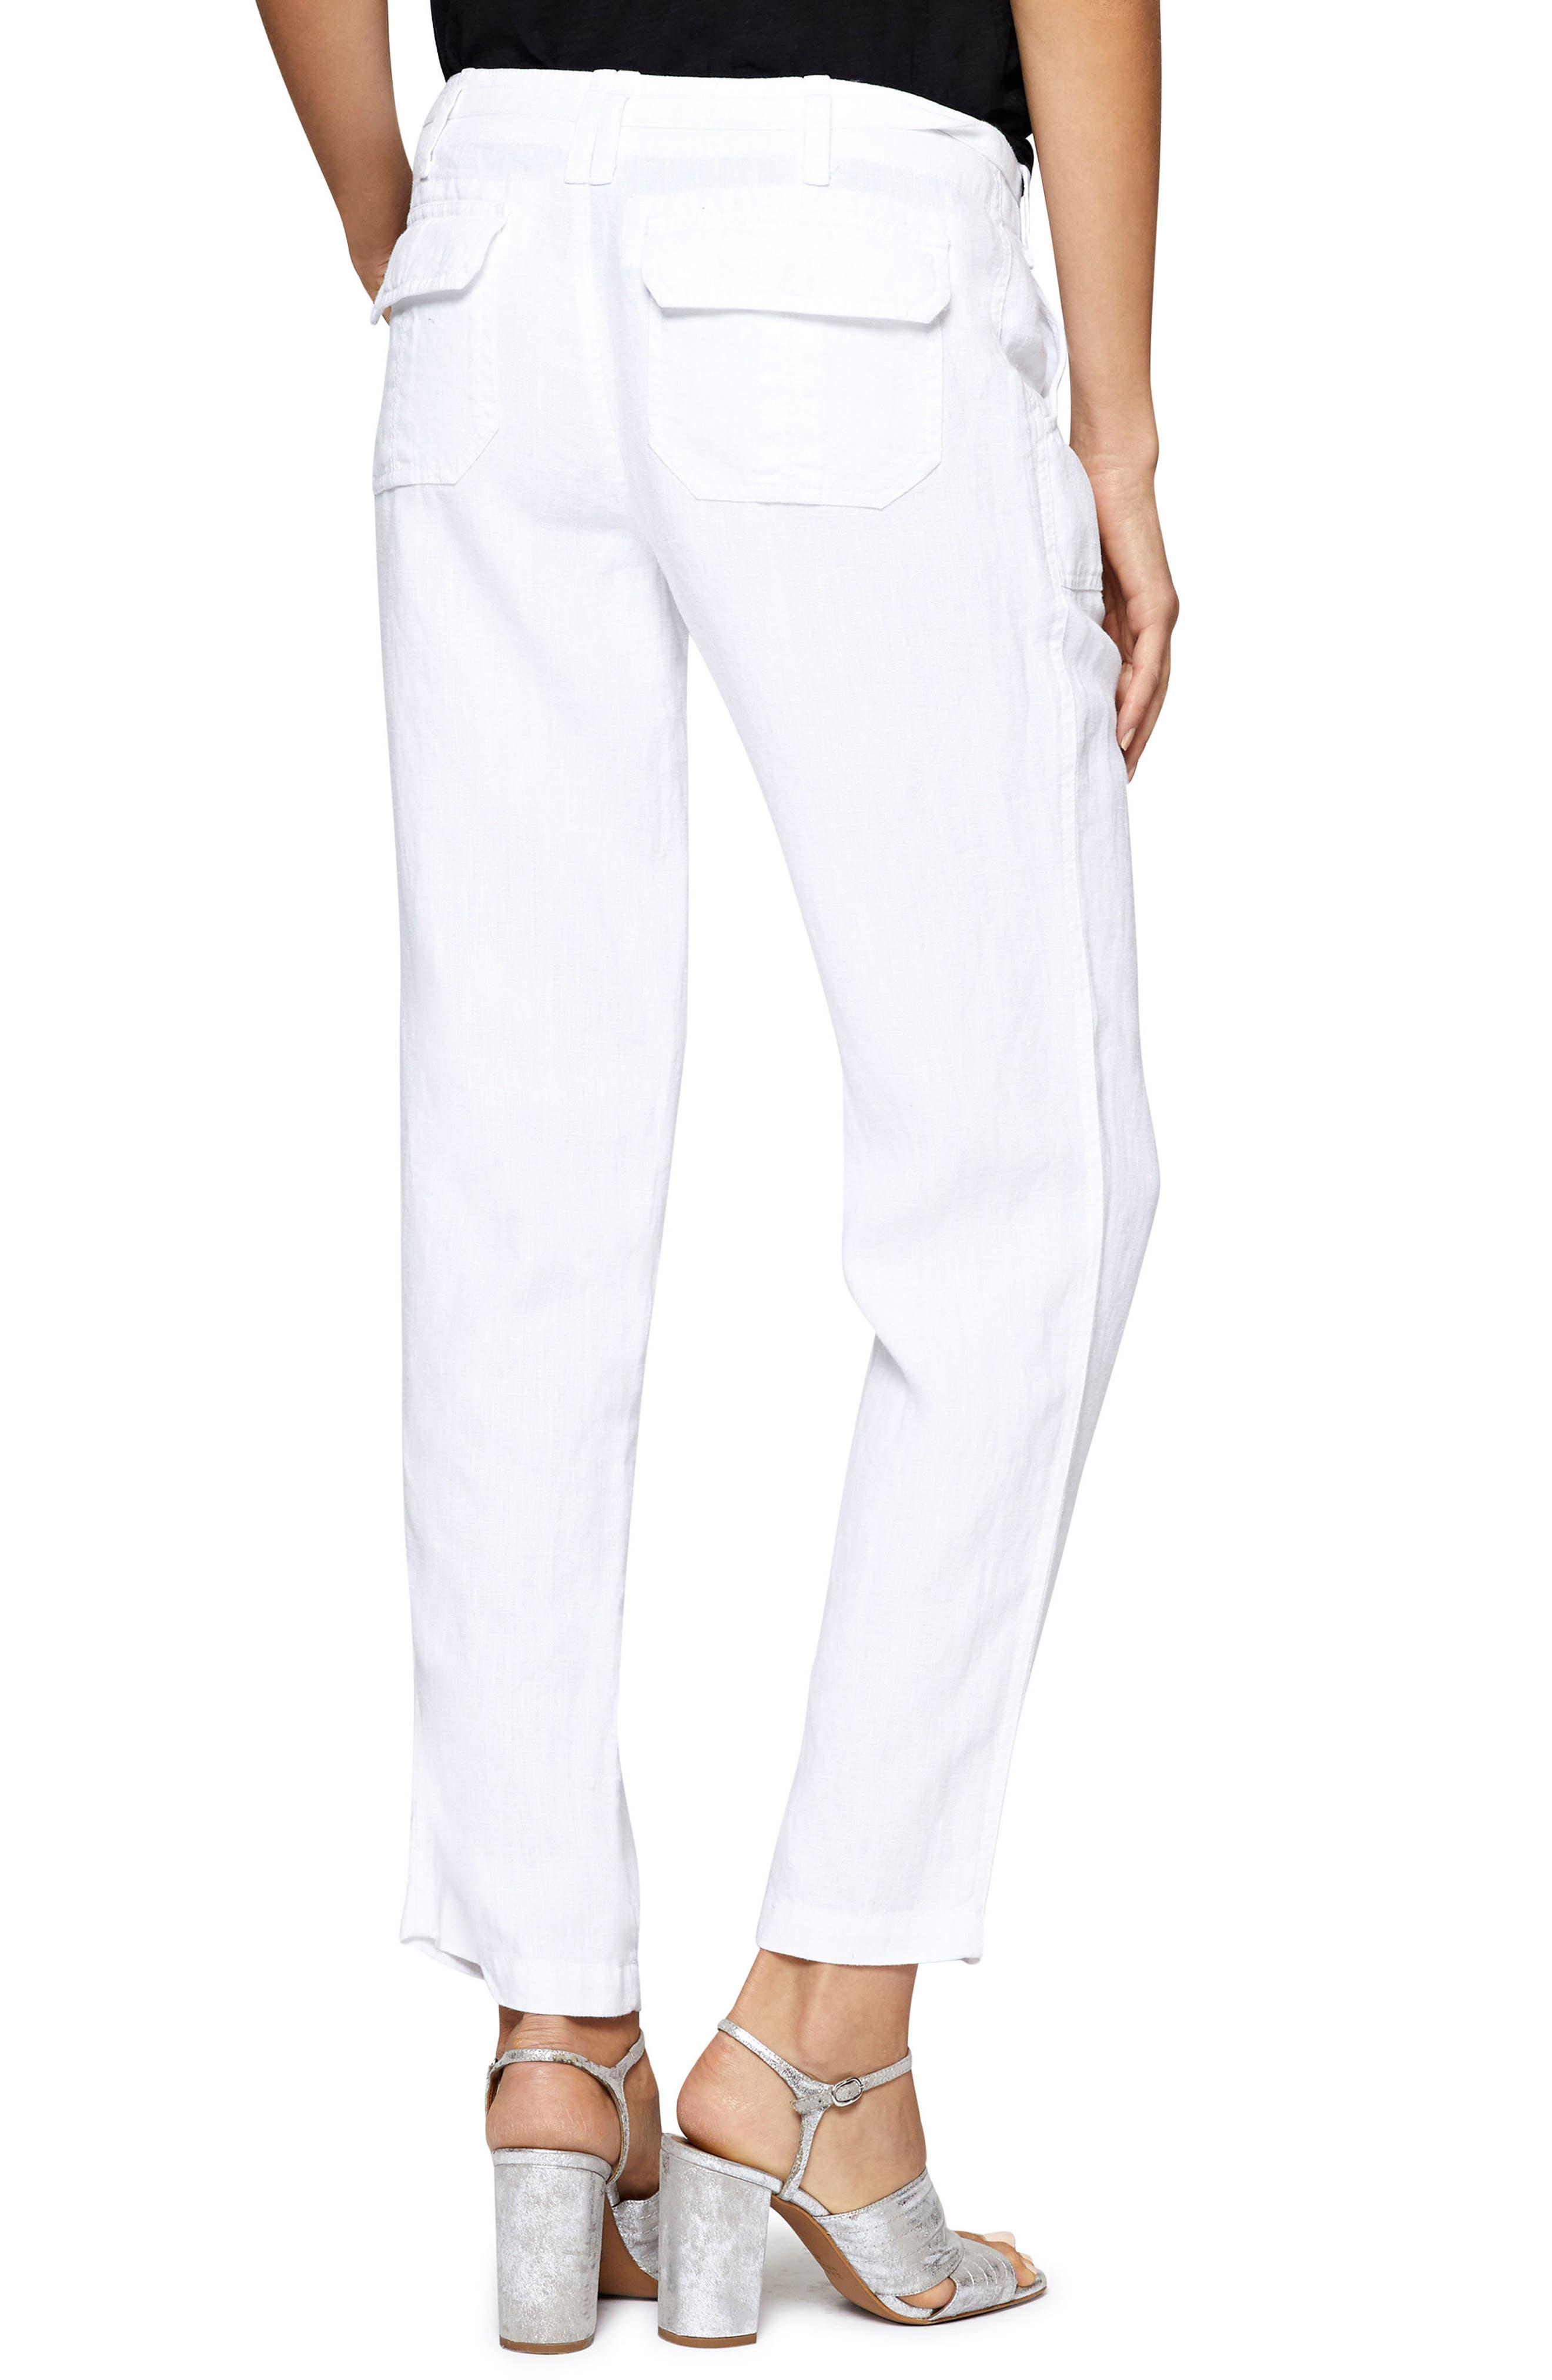 Beachcomber Linen Pants,                             Alternate thumbnail 2, color,                             White